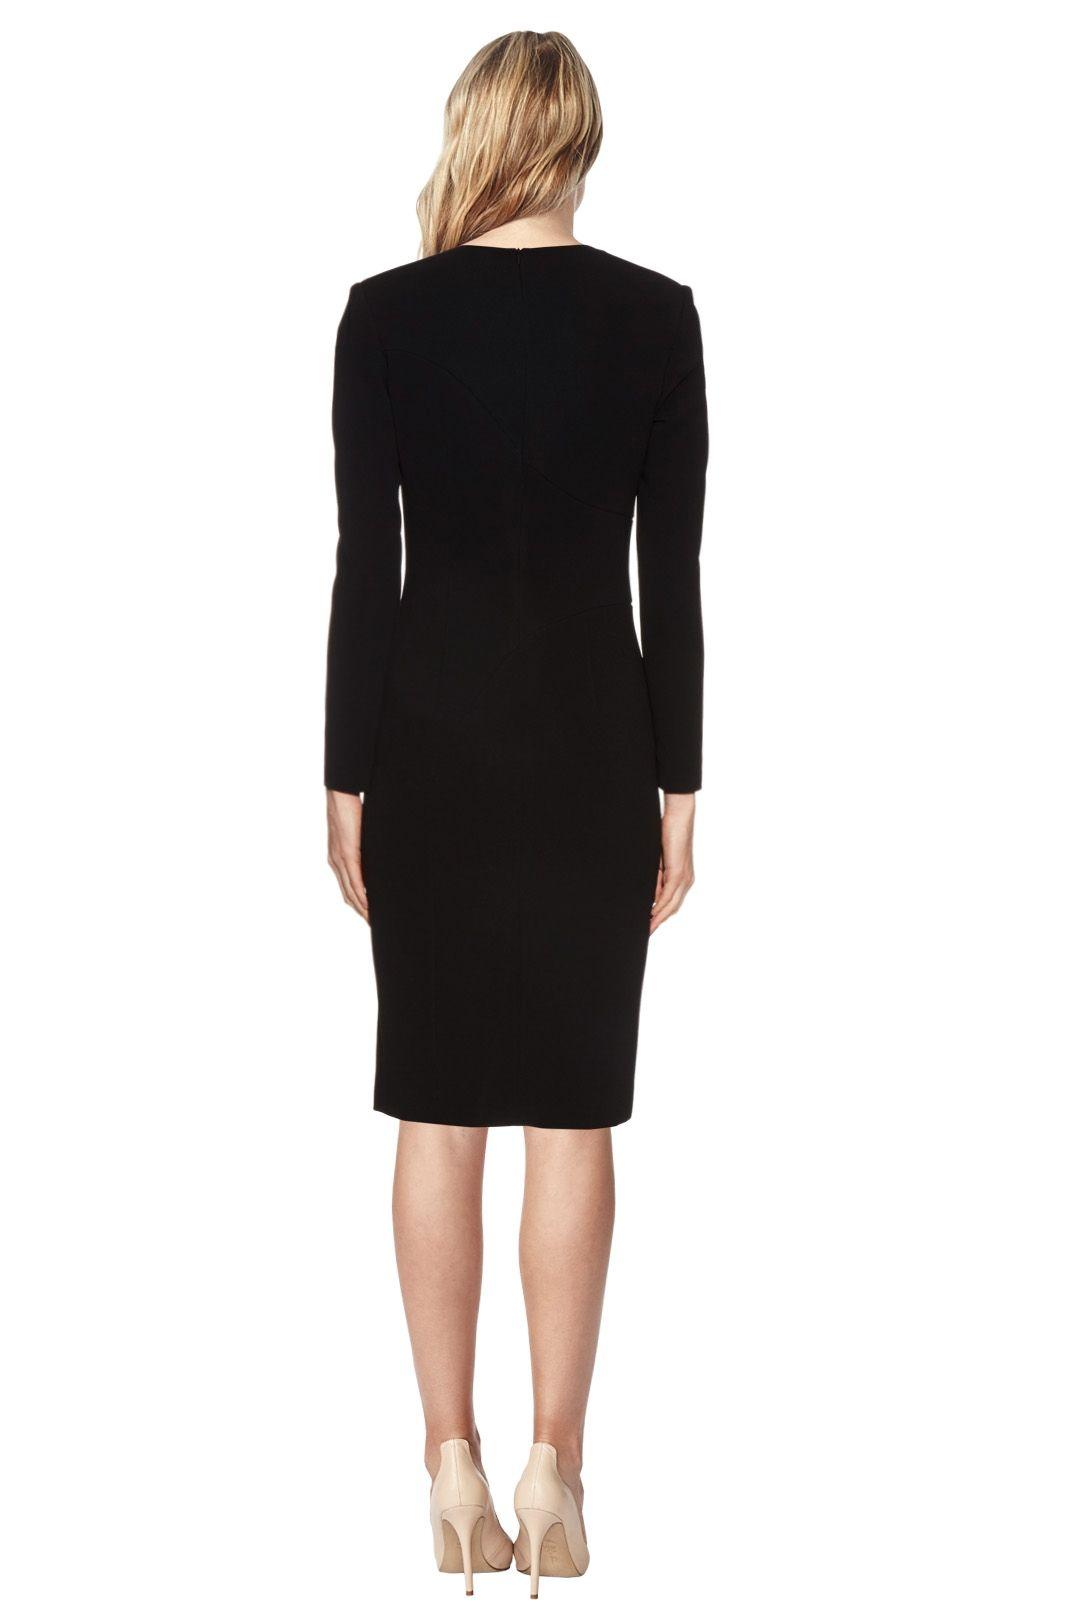 La Mania - Antares Long Sleeved Crepe Dress - Black - Back